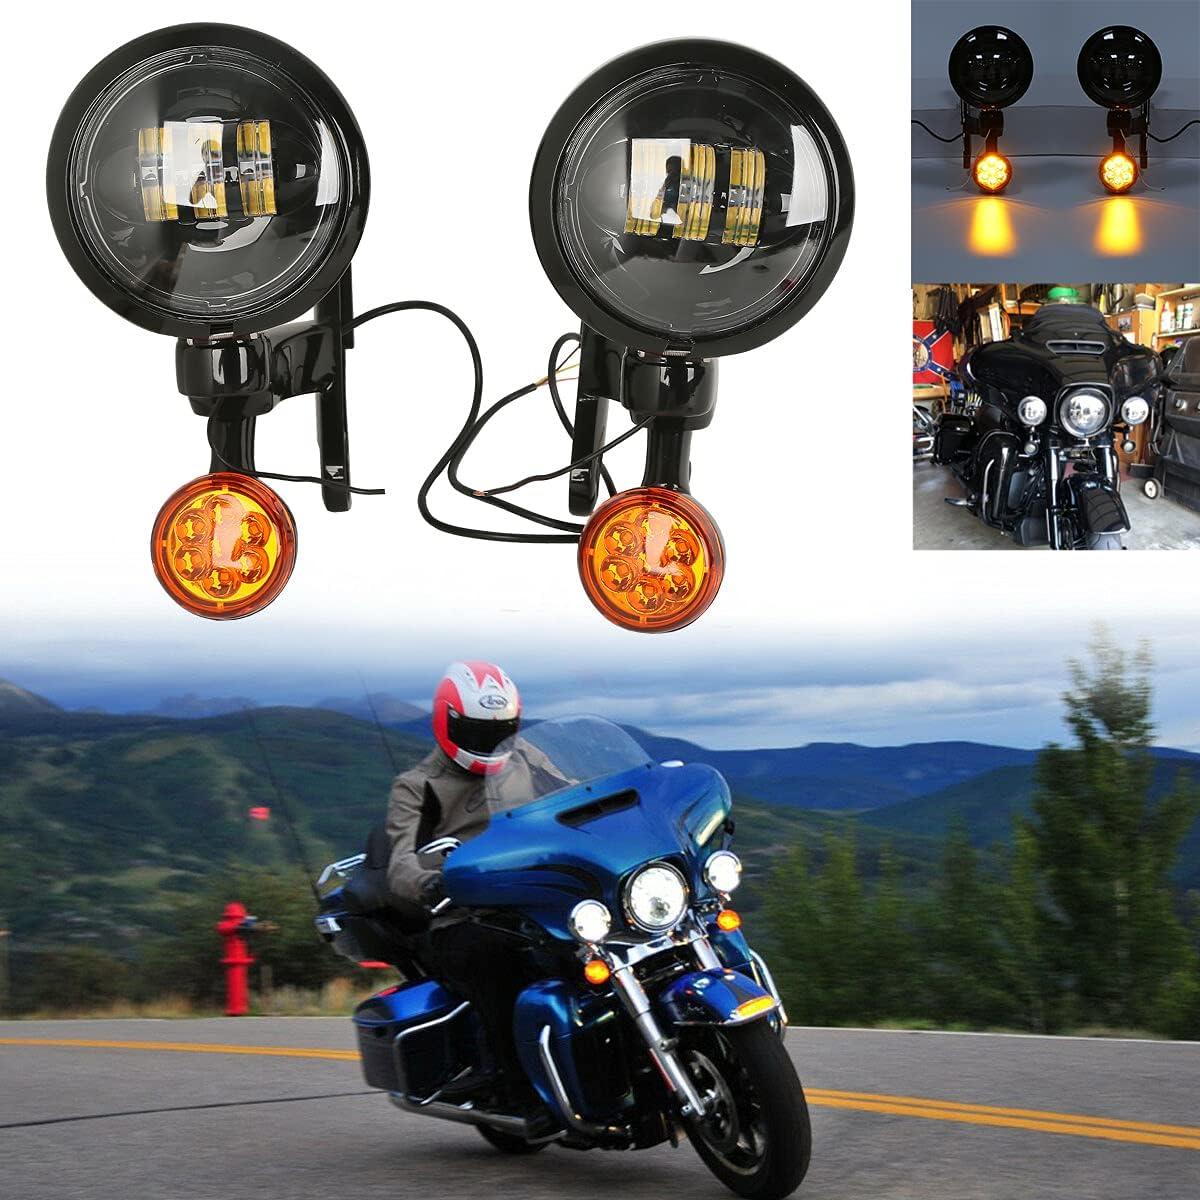 SLMOTO Spot Outlet ☆ Free Shipping Fog Light Bracket Turn Harley for Signal New York Mall Fit Touring